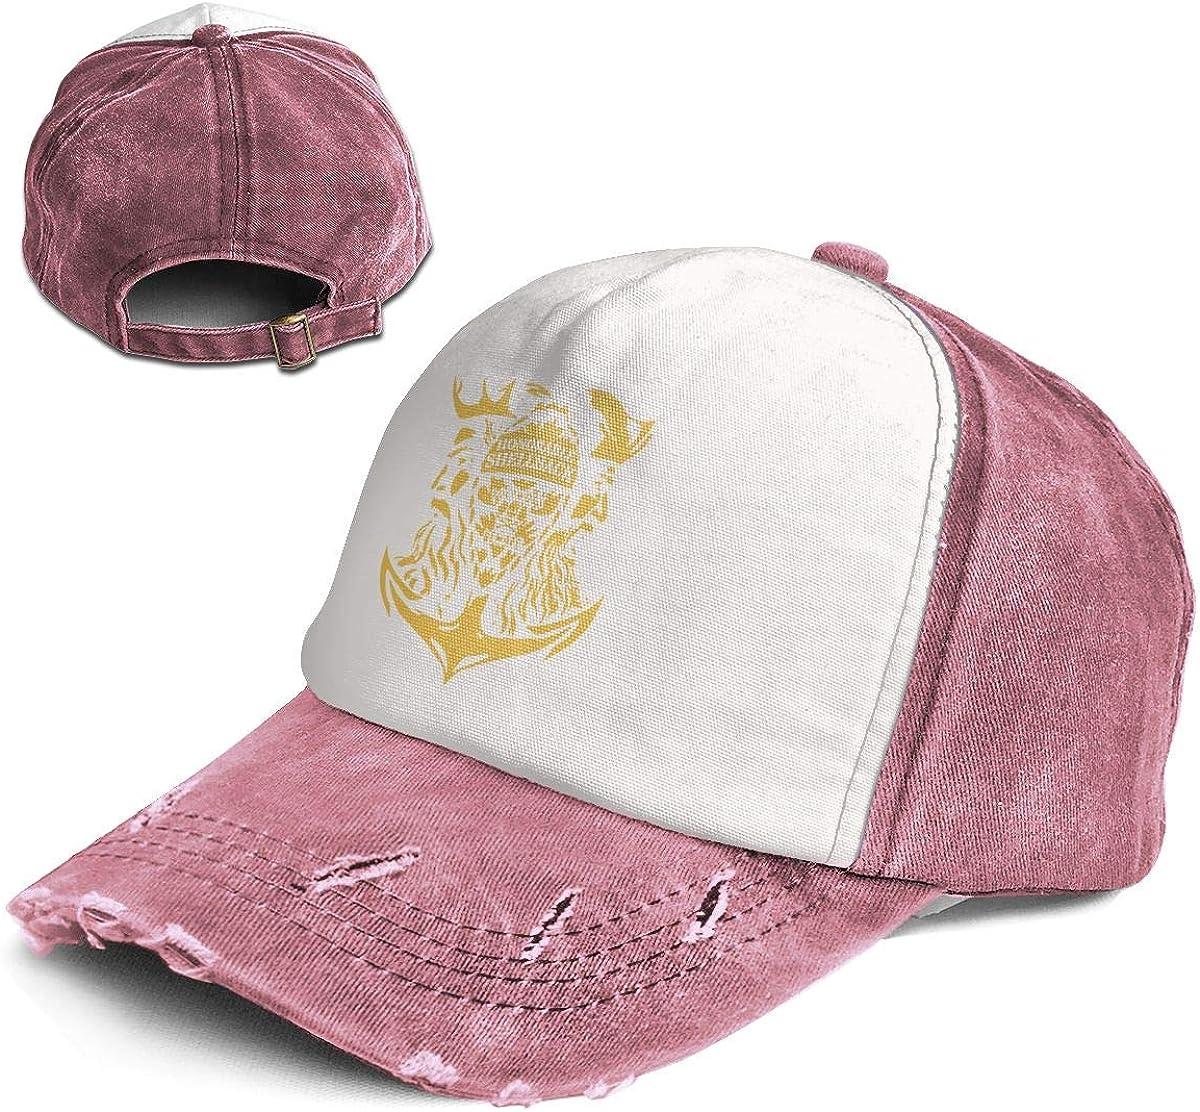 Original Navy Honorable Shellback USN Trend Printing Cowboy Hat Fashion Baseball Cap for Men and Women